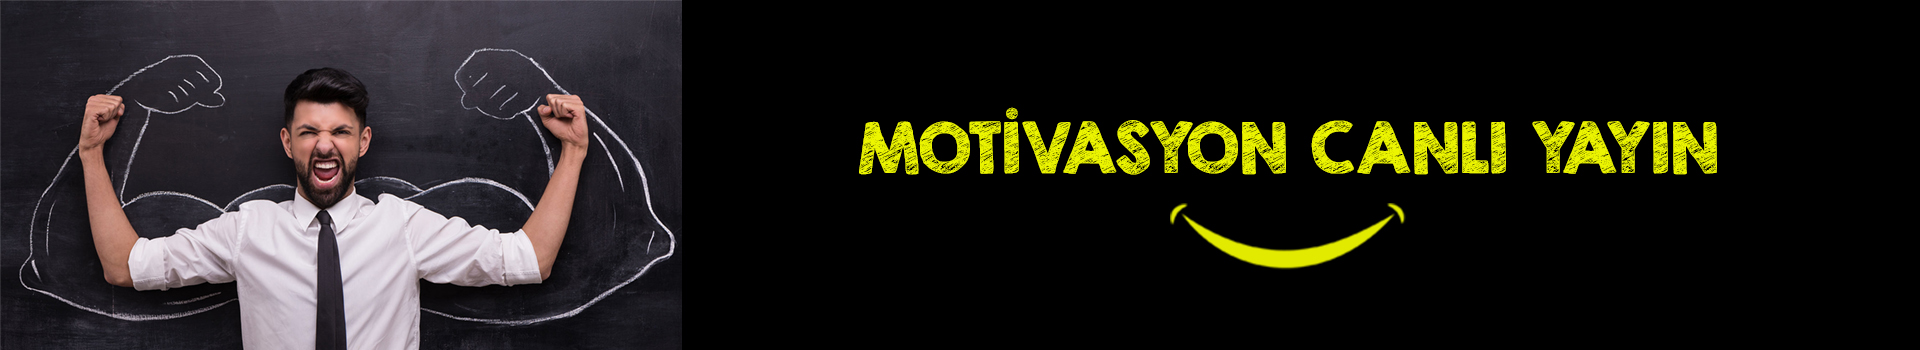 motivasyon banner tasarimi ajans724